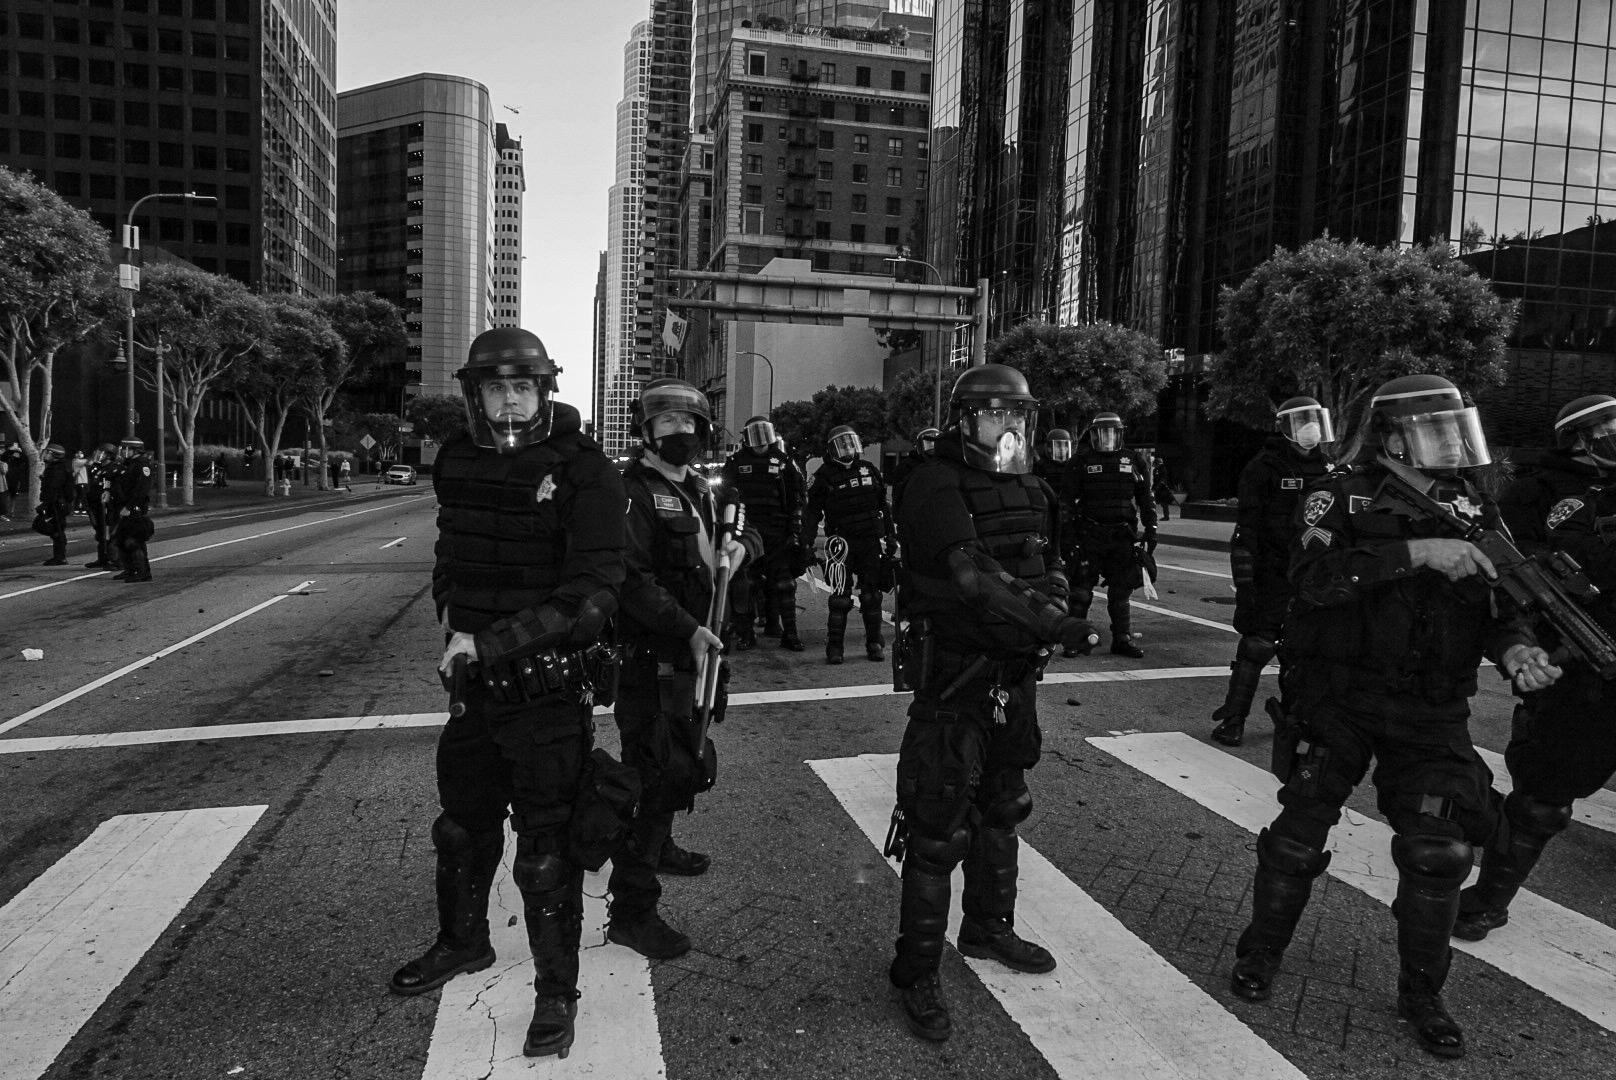 foto-proteste-razzismo-black-lives-matter